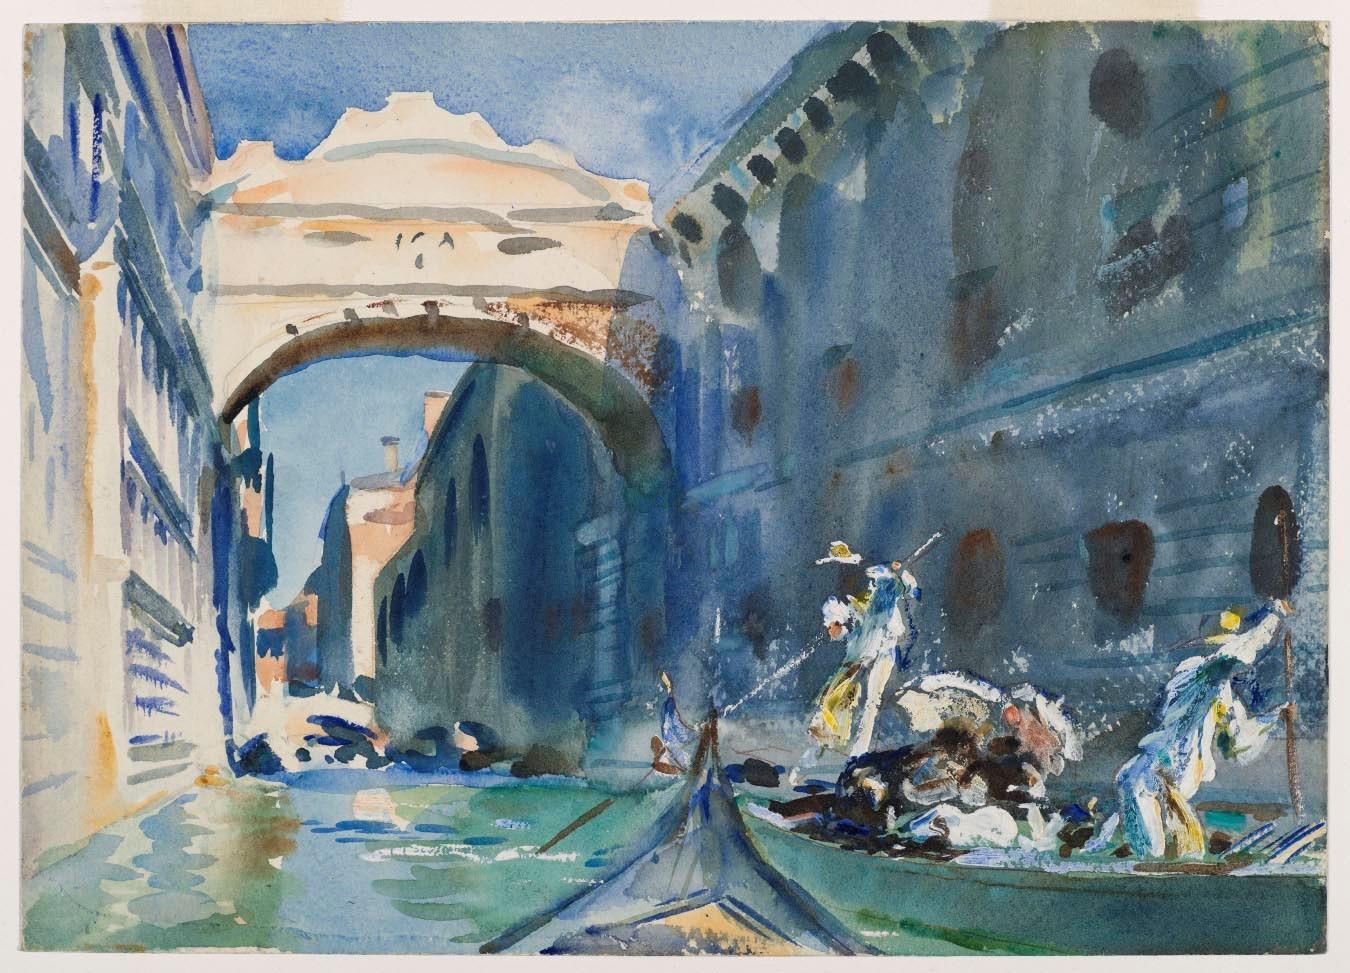 Watercolor art galleries in houston - View Slideshow